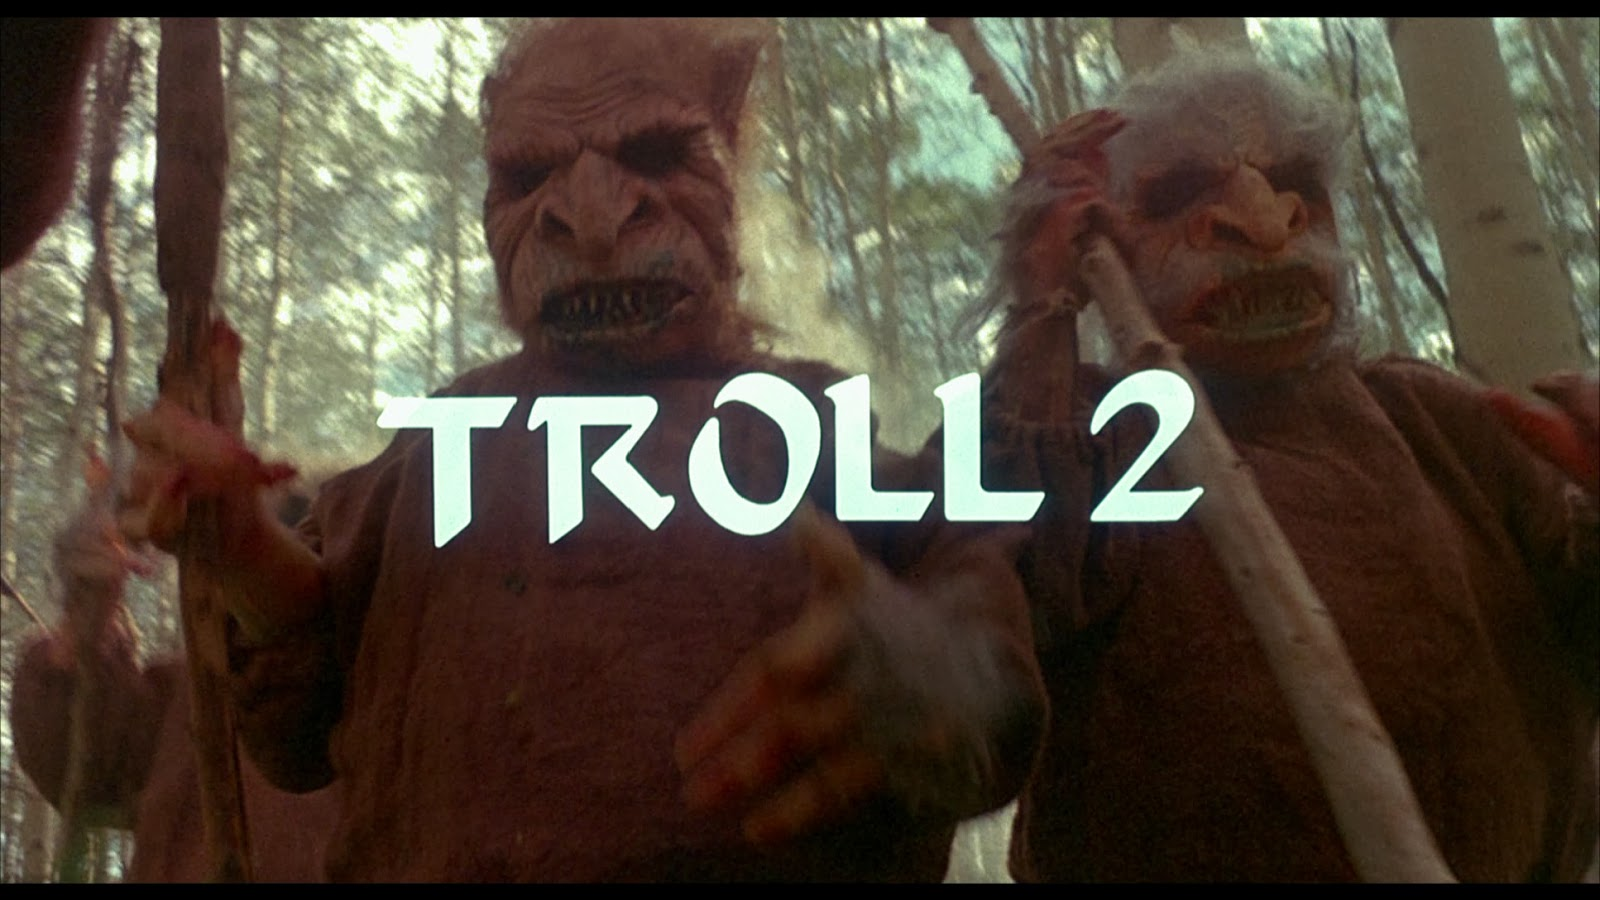 Bad Netflix Movie Night: Nilbog, That's Goblin Spelled